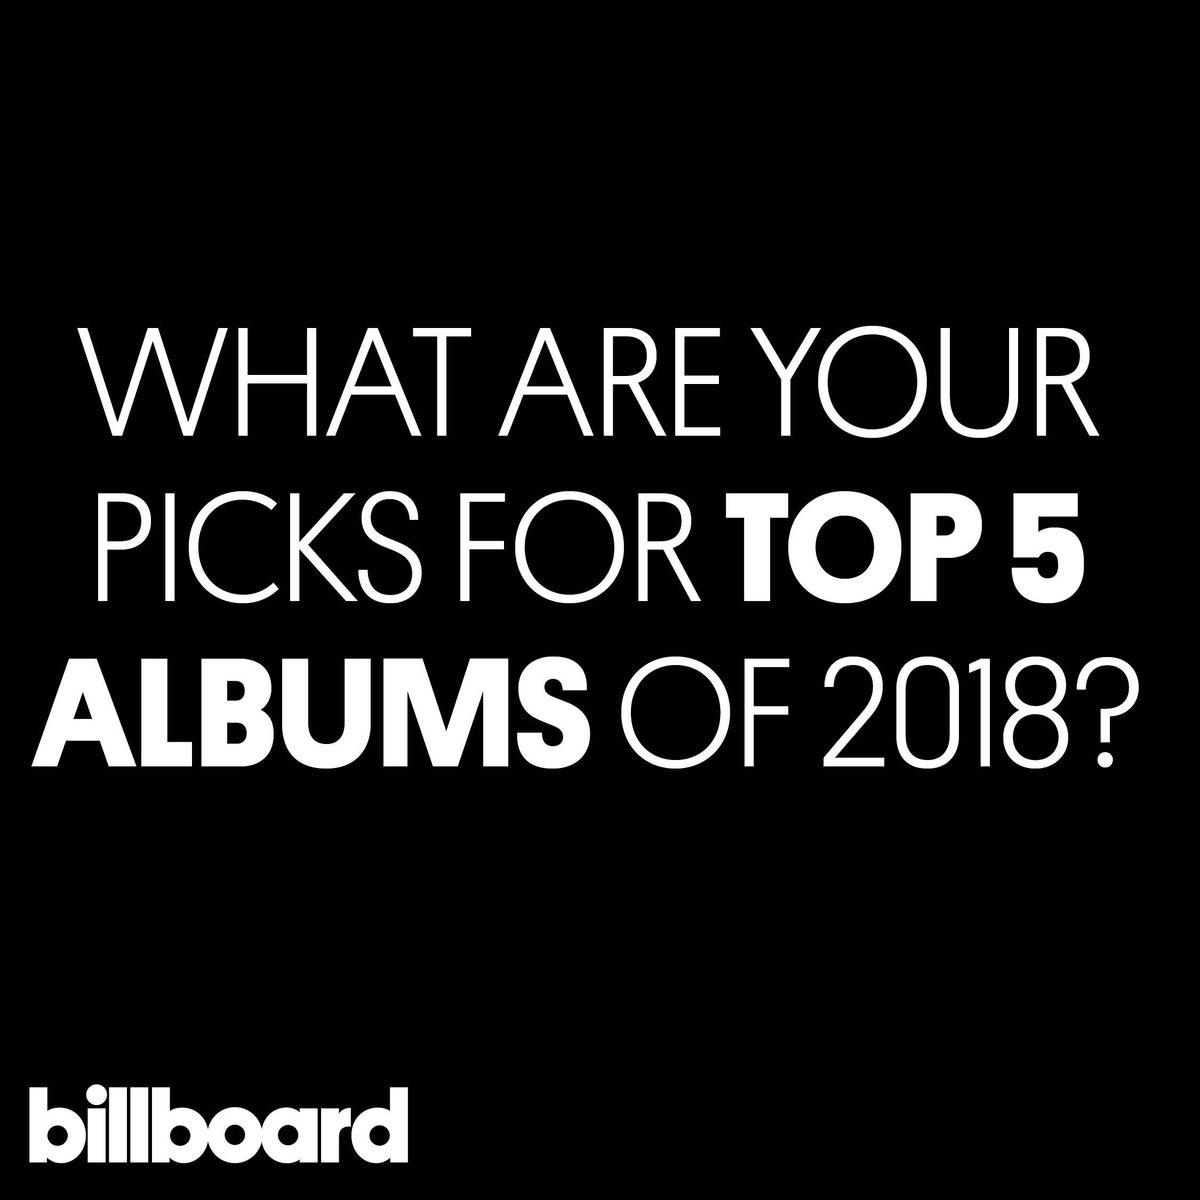 Top 5 albums of 2018? 🤔   #yearinmusic https://t.co/K2MzMdpwf5